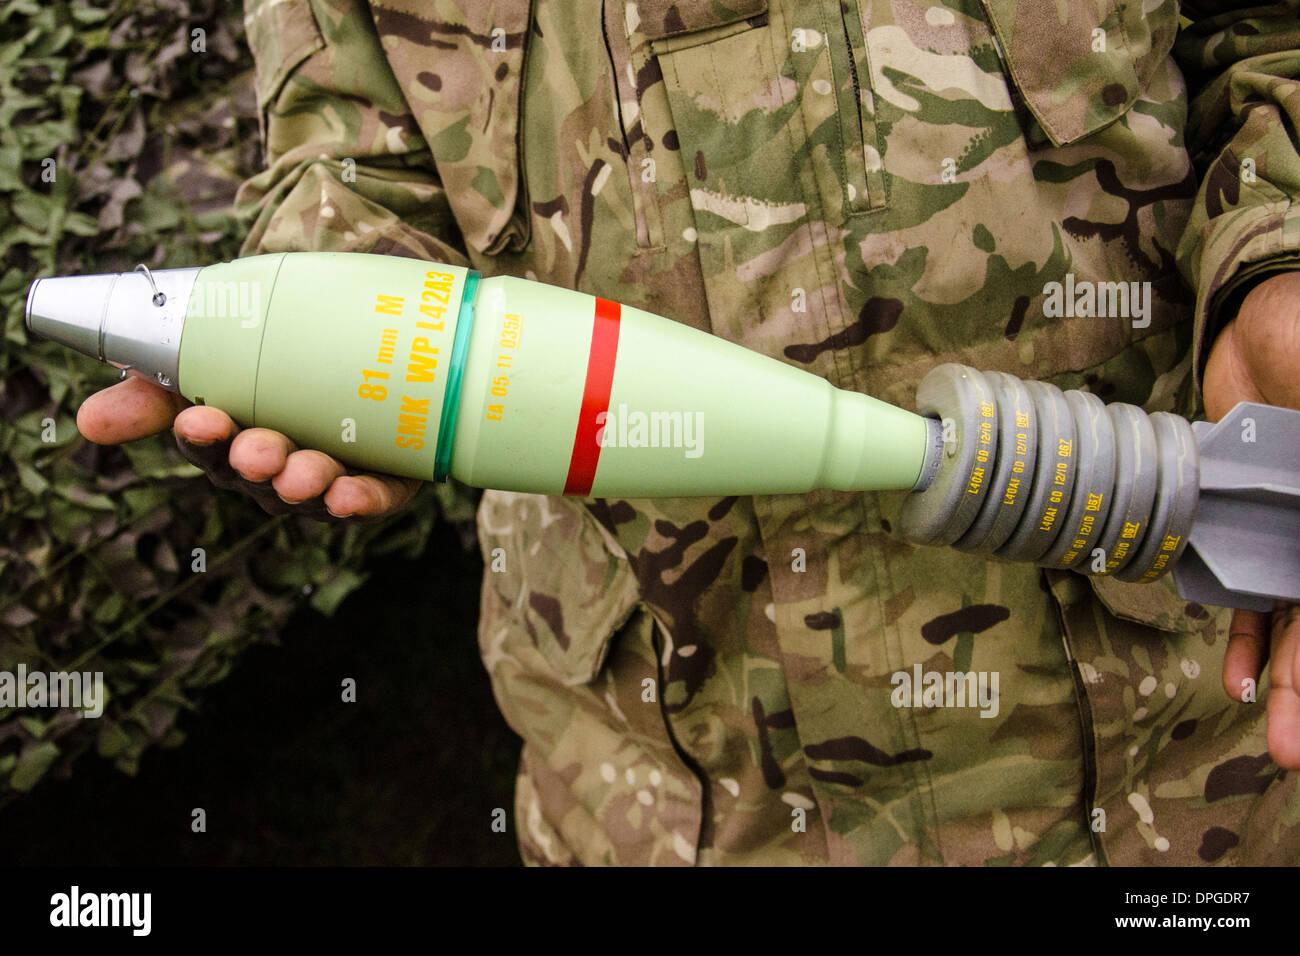 81mm rounds,wp,white,phosphorus, ammunition ammo munitions  munitions bullets bomb rockets shells , boxes 81mm mortar rounds - Stock Image